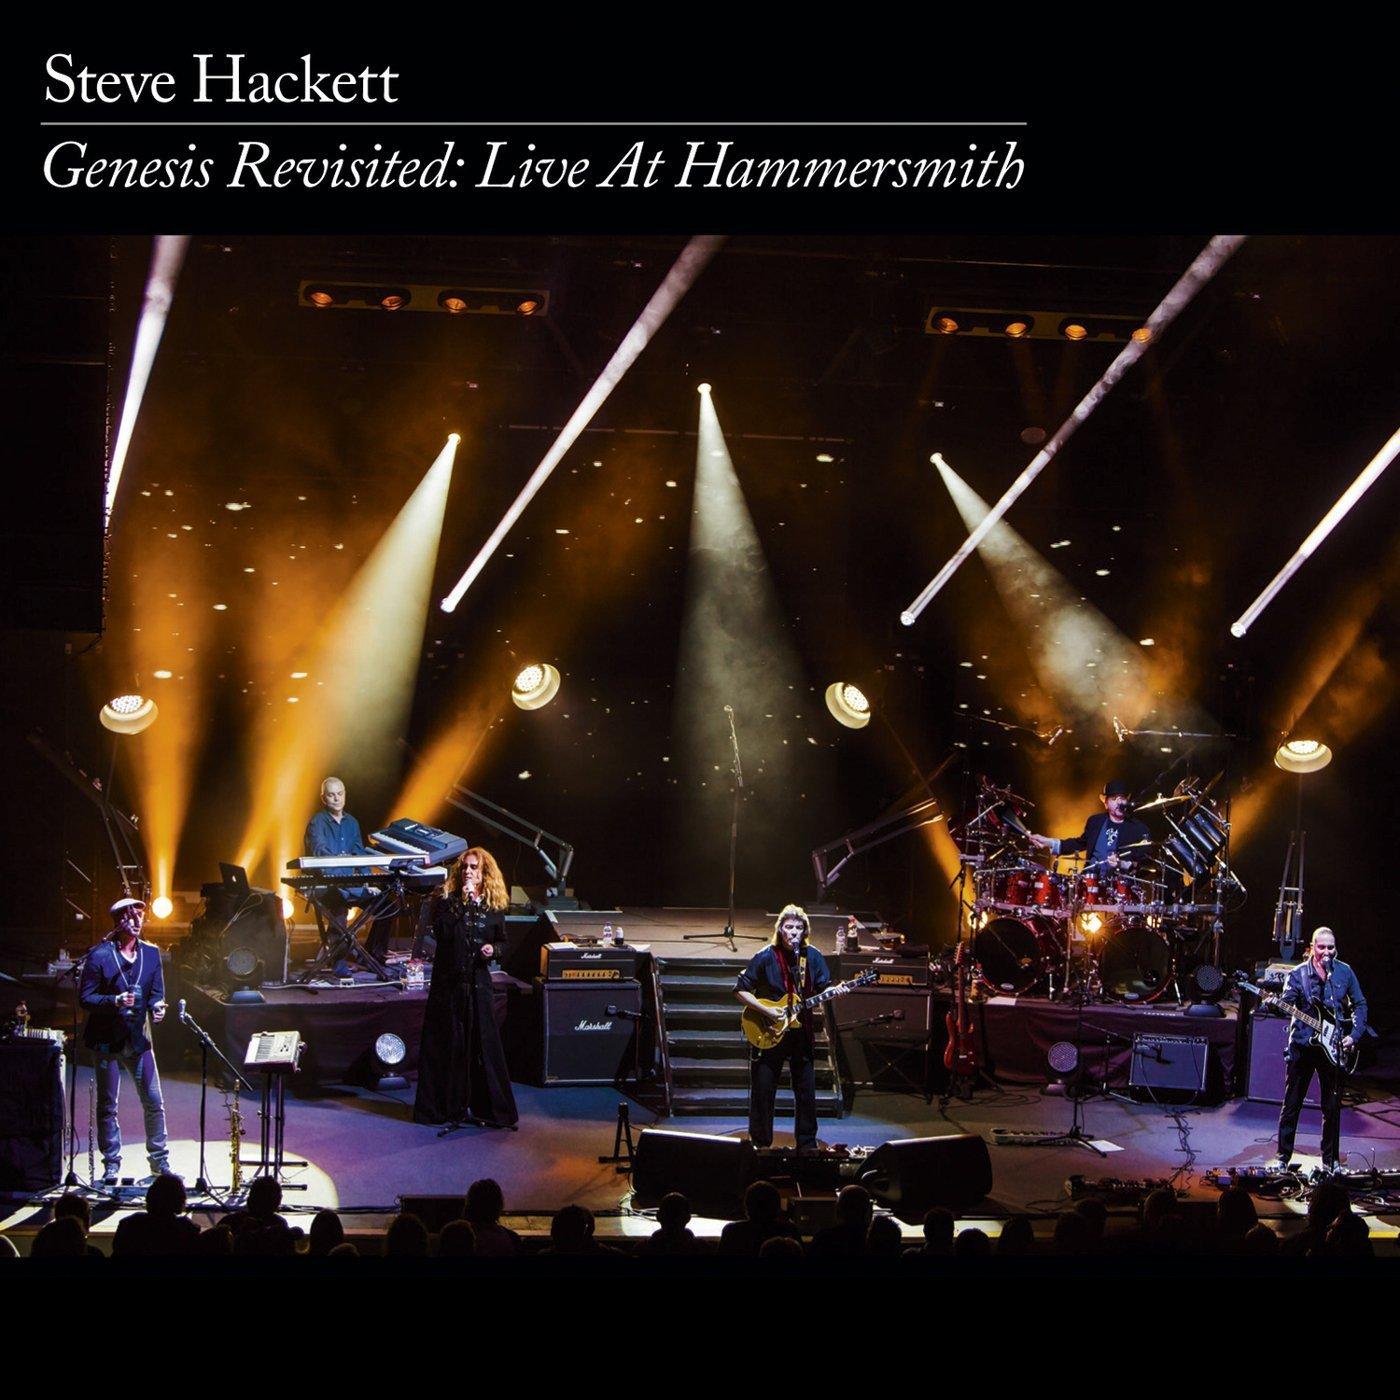 Genesis Revisited: Live at Hammersmith - Steve Hackett: Amazon.de: Musik